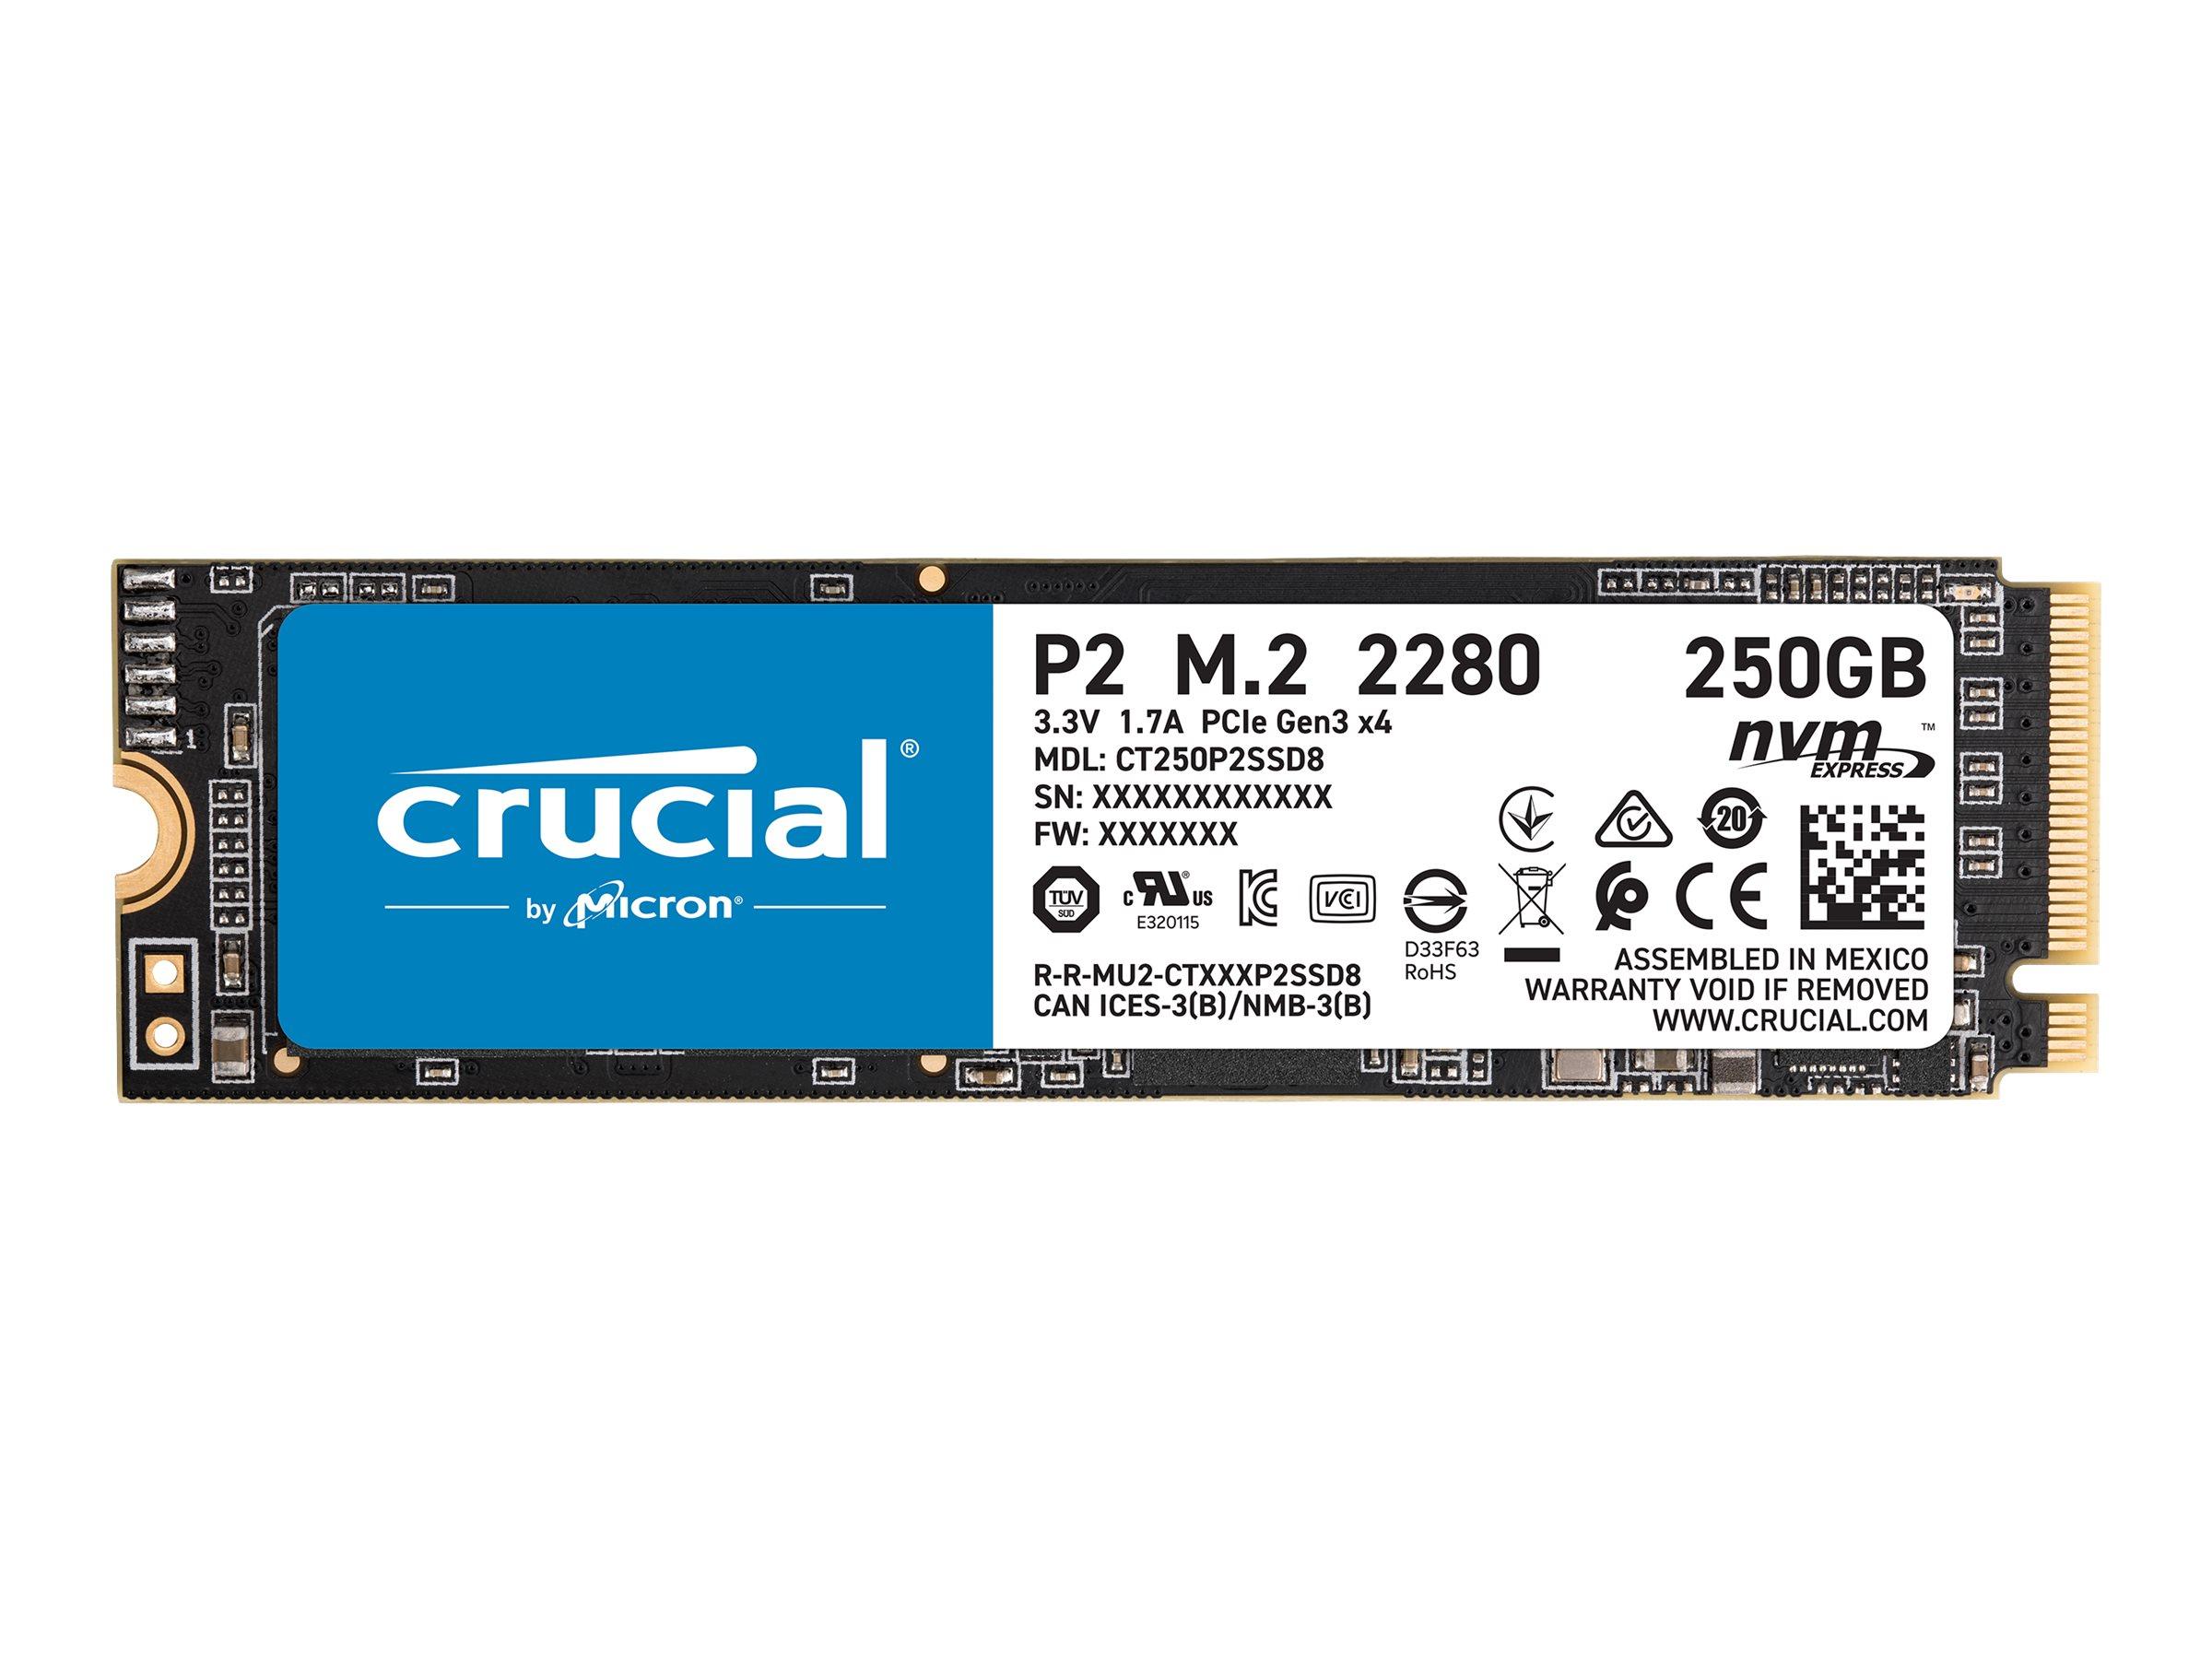 Vorschau: Crucial P2 - 250 GB SSD - intern - M.2 2280 - PCI Express 3.0 x4 (NVMe)